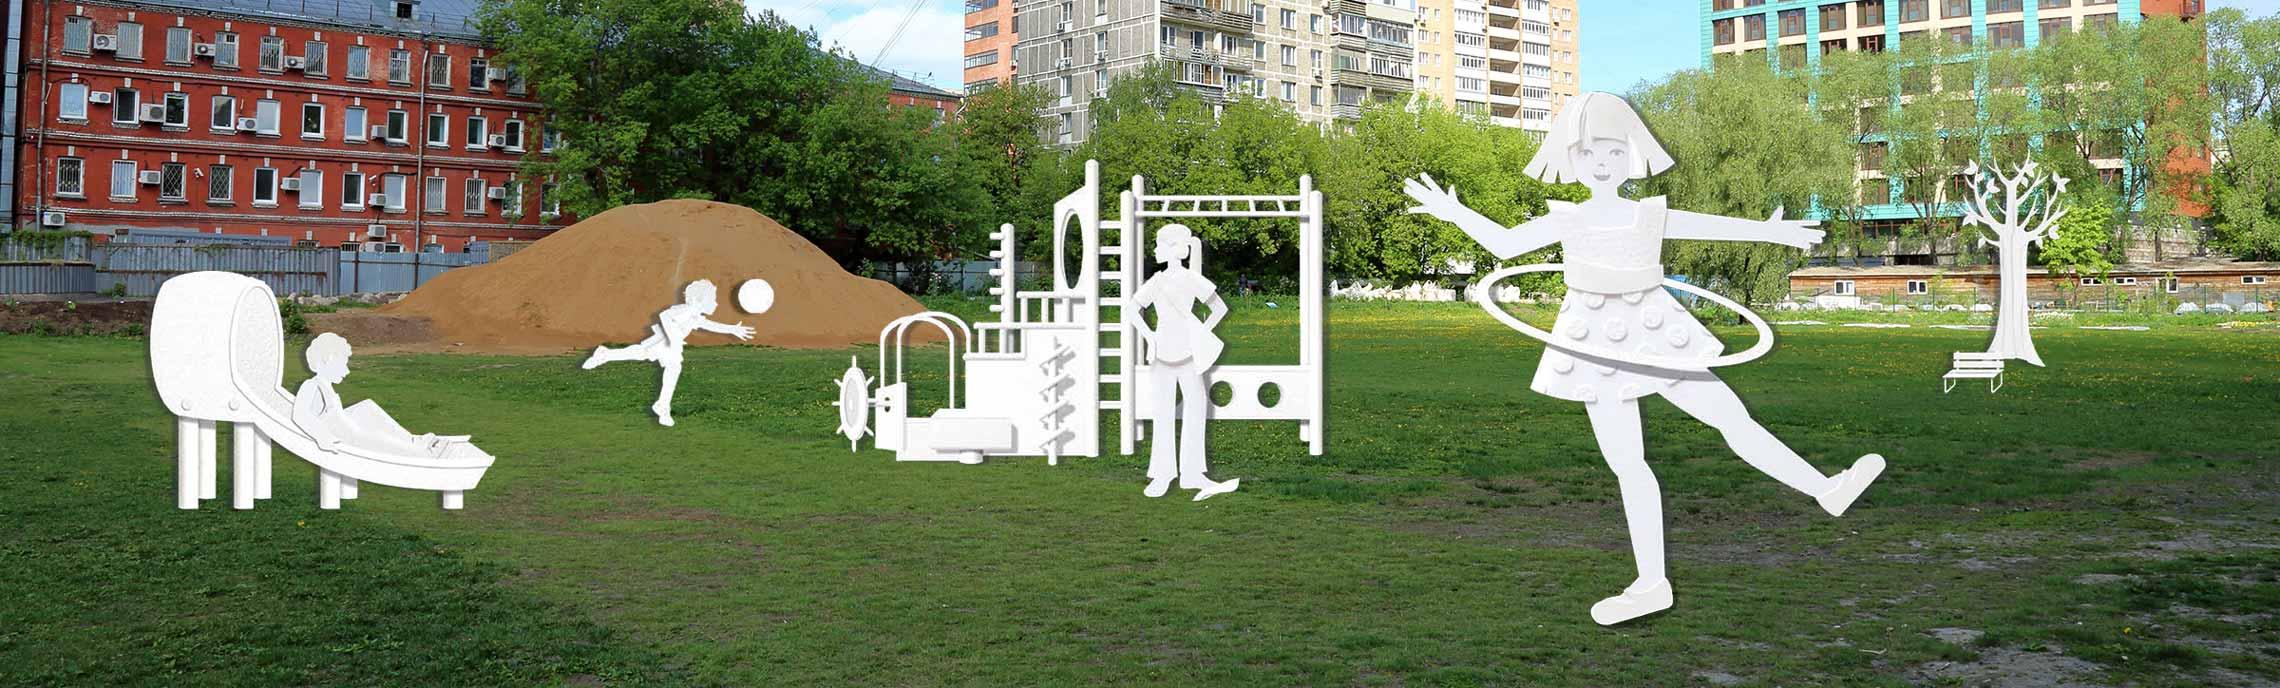 create parks